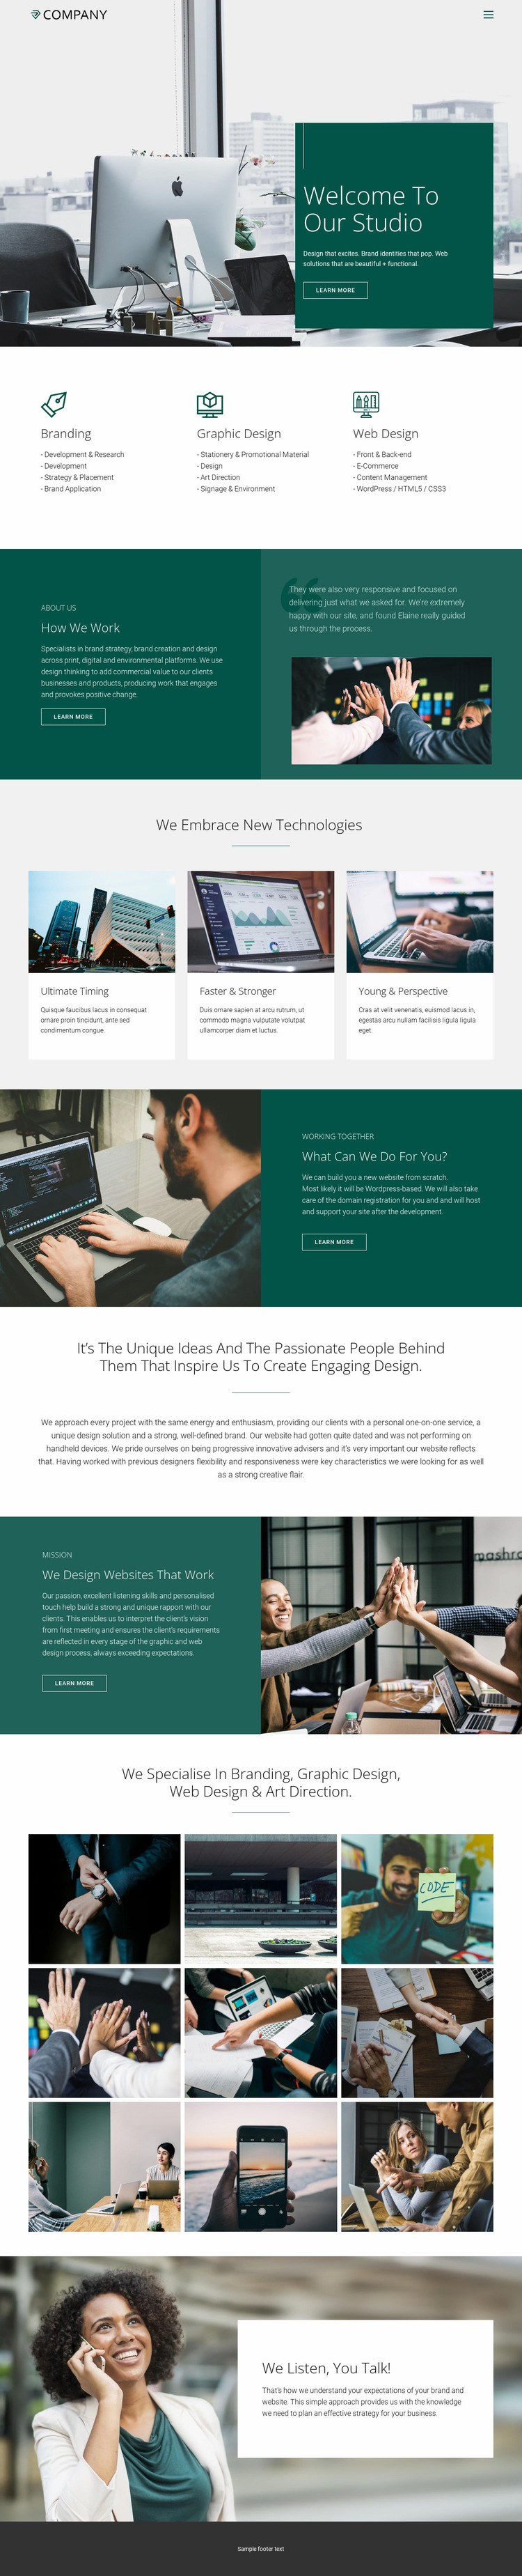 Trusty relations in business Website Mockup